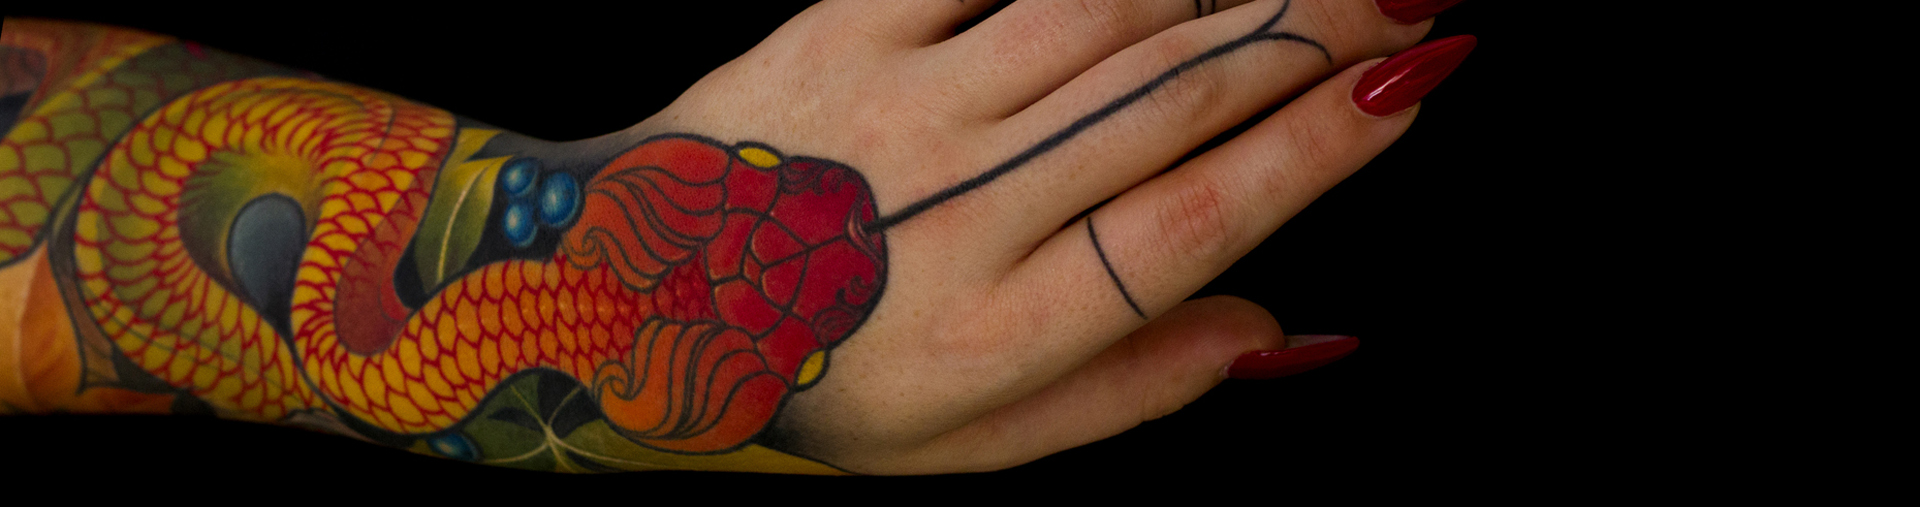 mano tatuaje serpiente